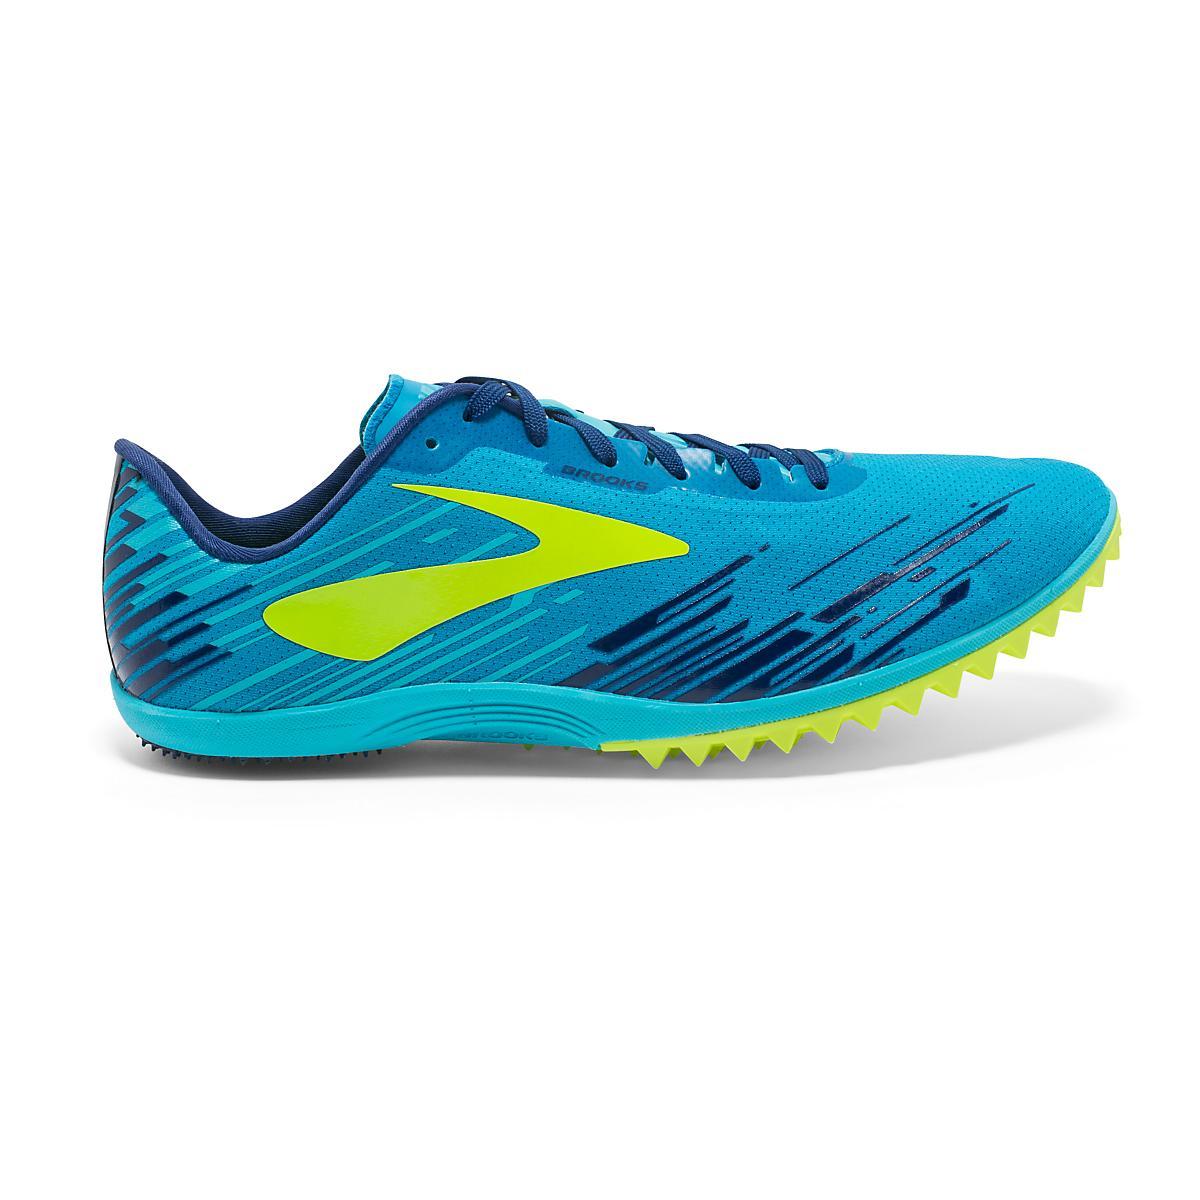 a66a265d0dc Mens Brooks Mach 18 Spikeless Cross Country Shoe at Road Runner Sports